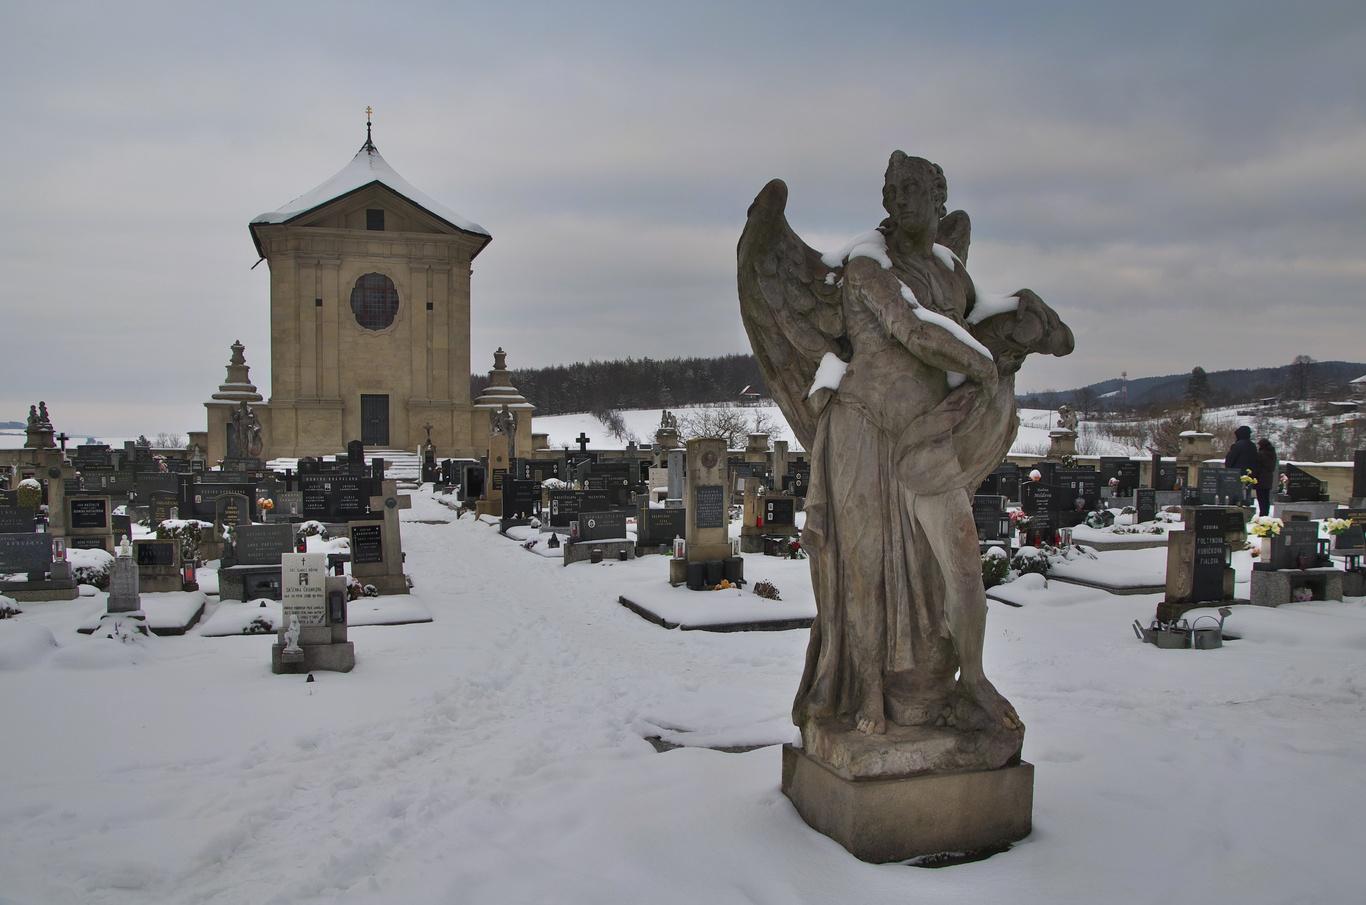 Střílky, barokní hřbitov